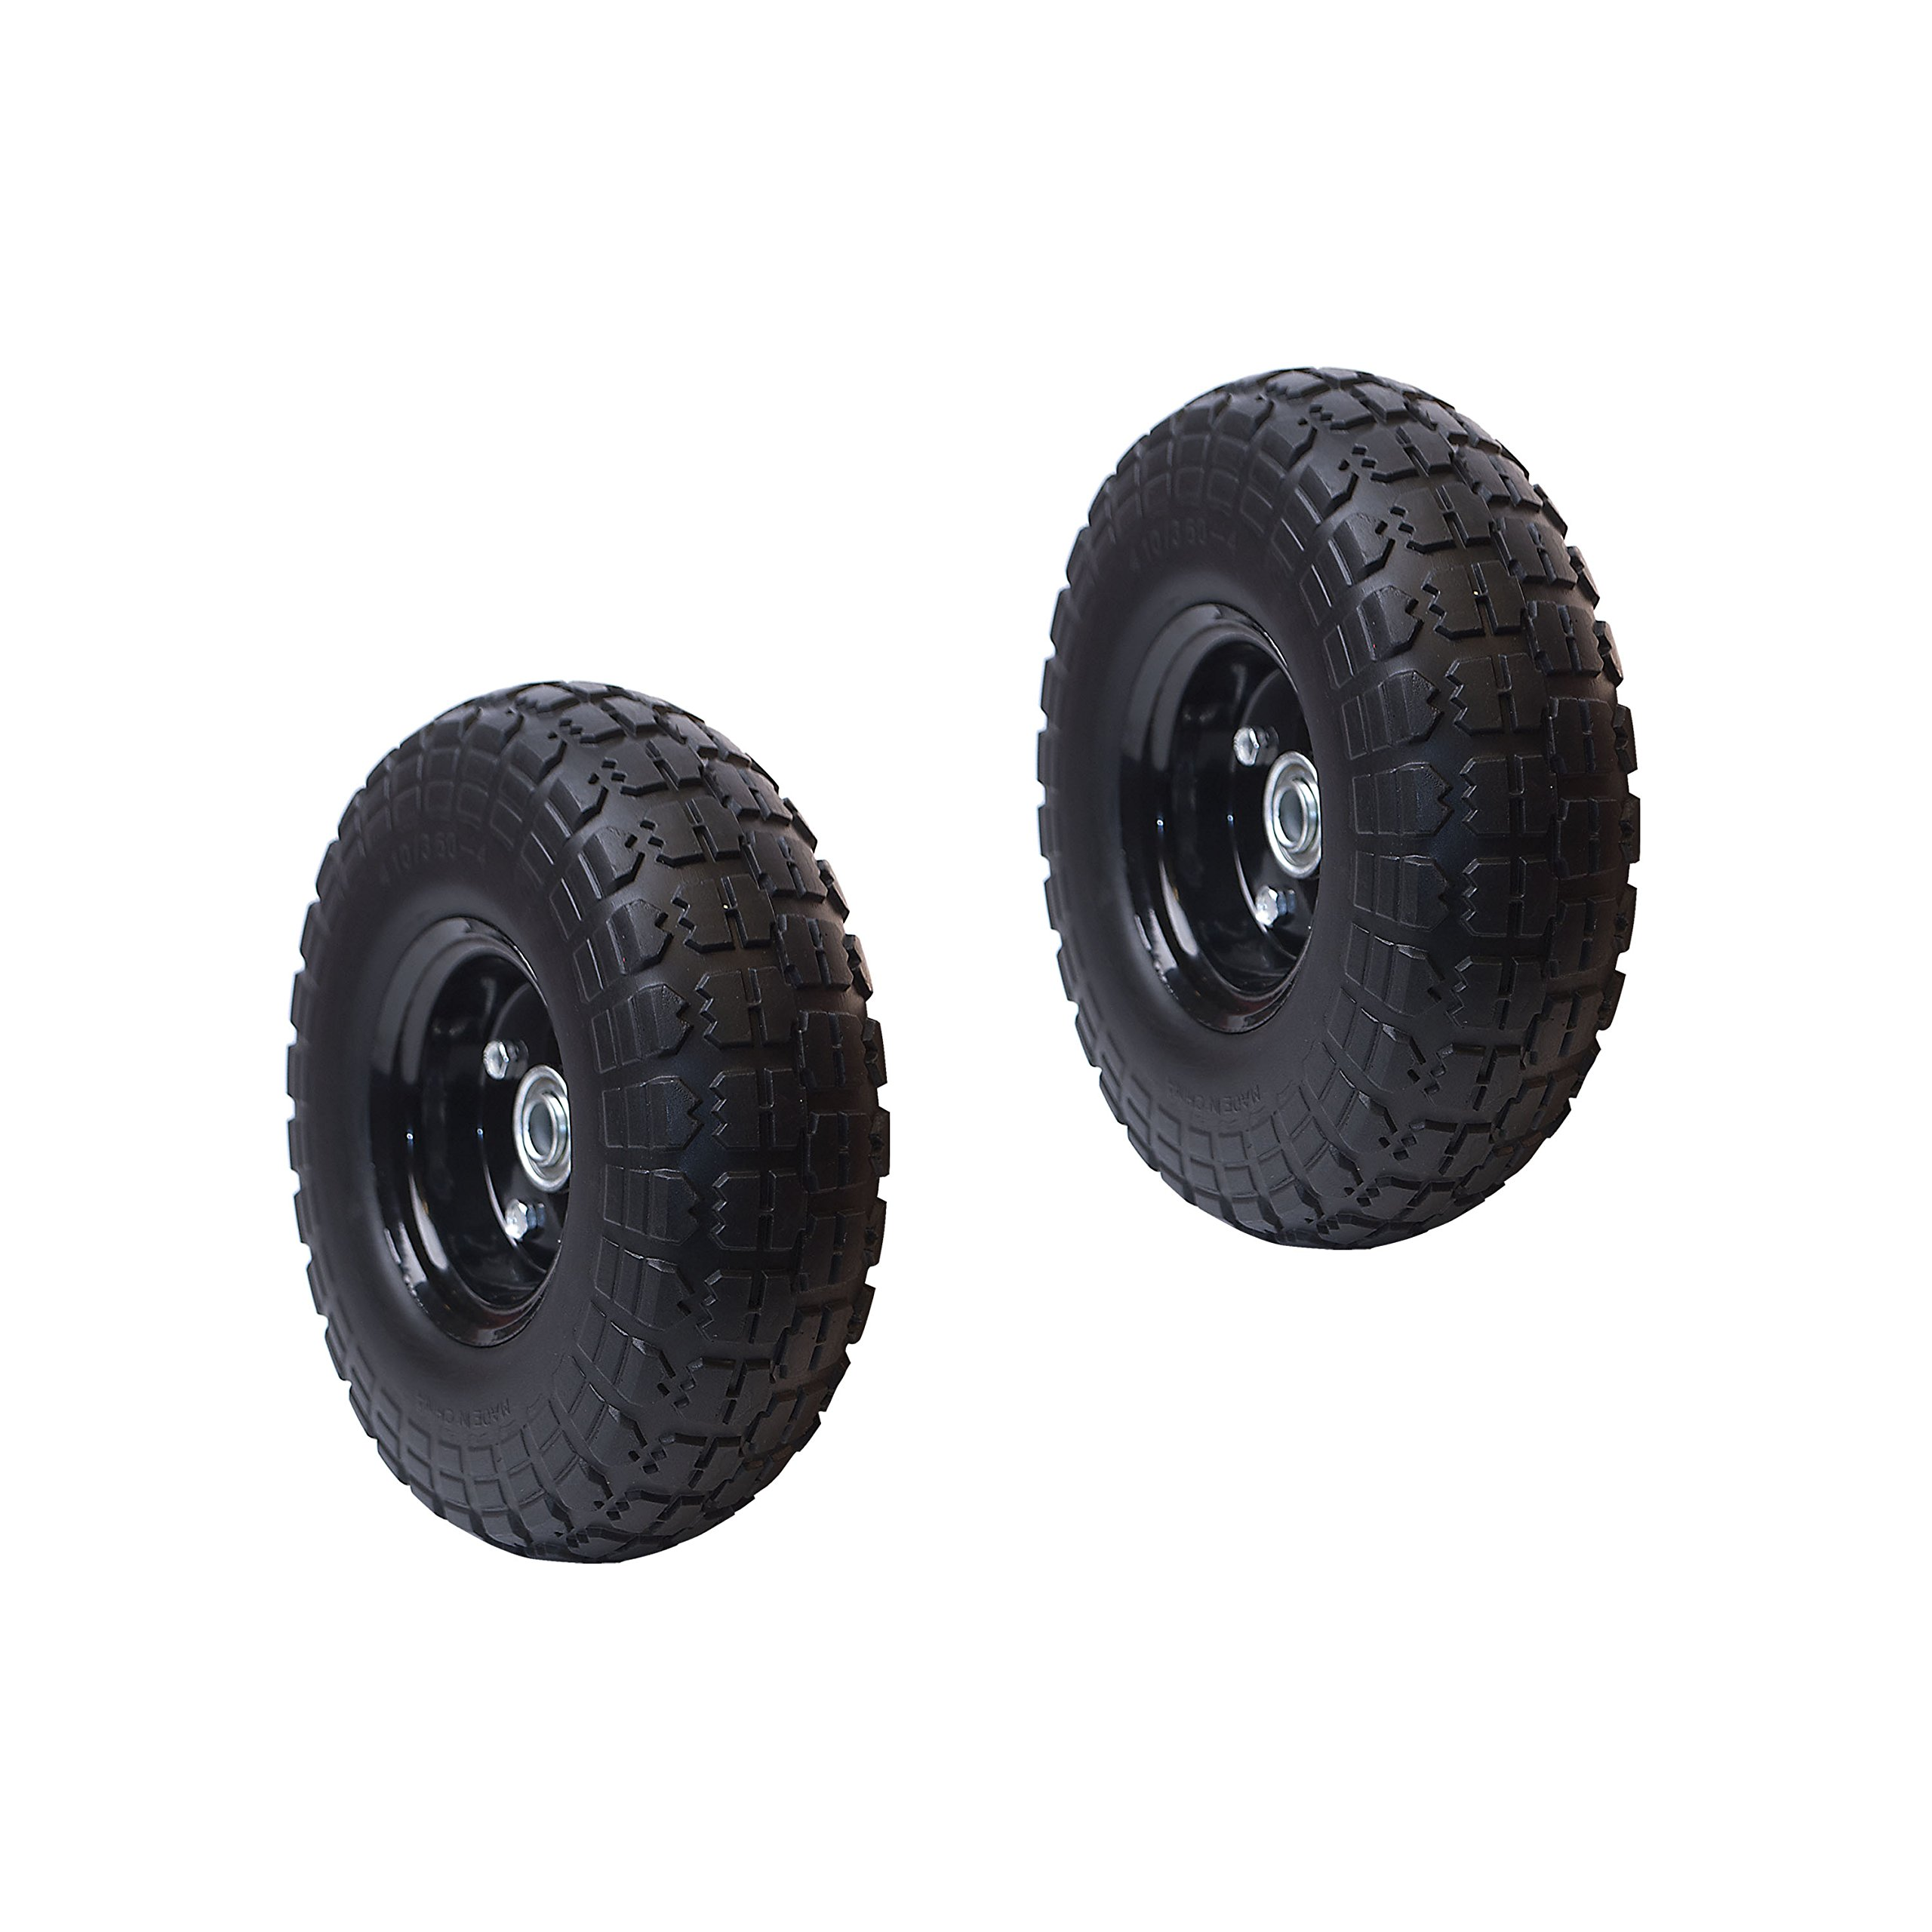 ALEKO 2WNF10 Anti Flat Replacement Turf Wheels for Wheelbarrow 10 Inch No Flat Tires, Set of 2, Black